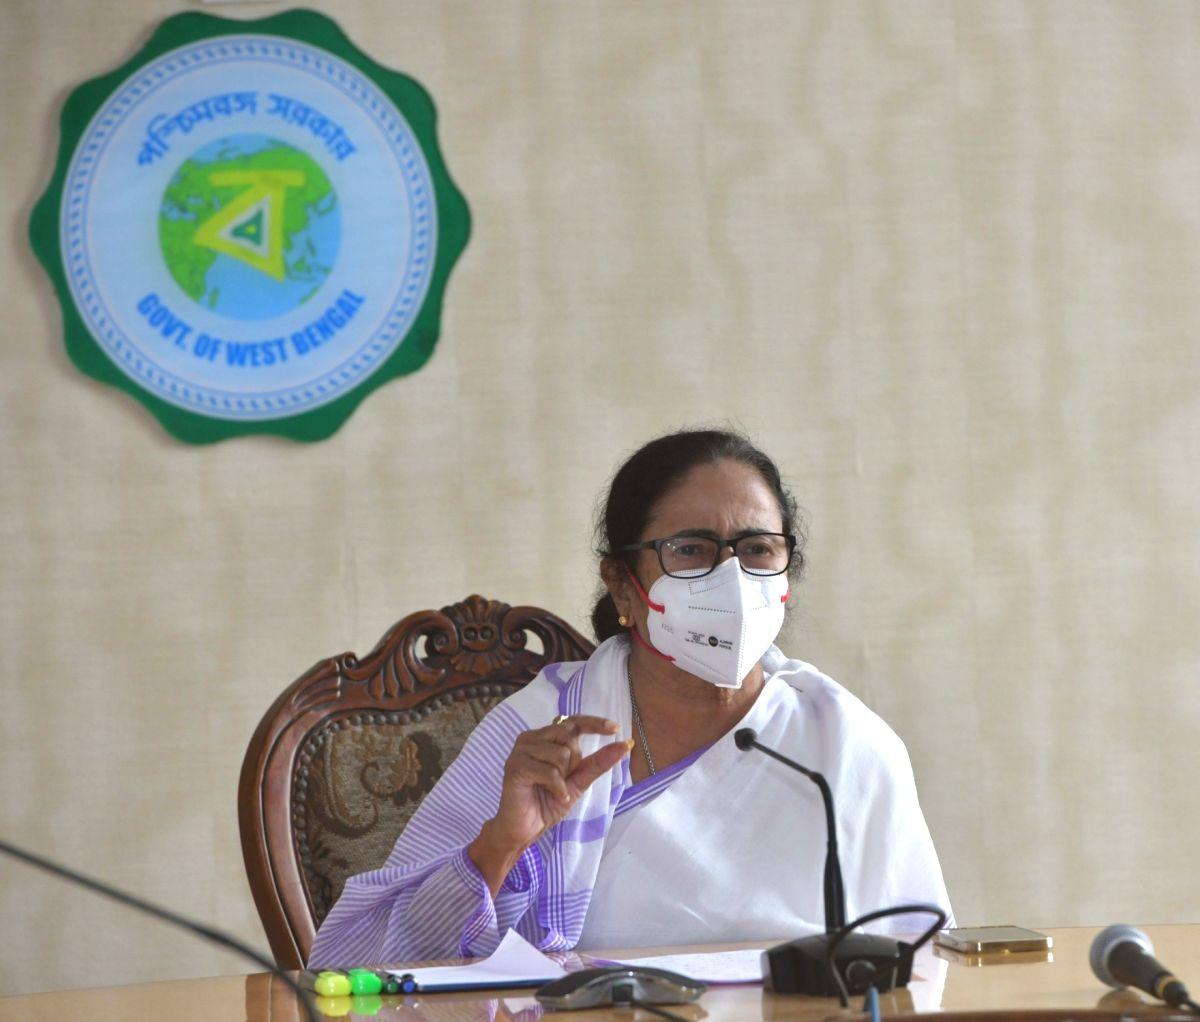 Kolkata: West Bengal Chief Minister Mamata Banerjee at a Press Conference increasing numbers of COVID 19 cases at Nabanna in Howrah on May 6, 2021.